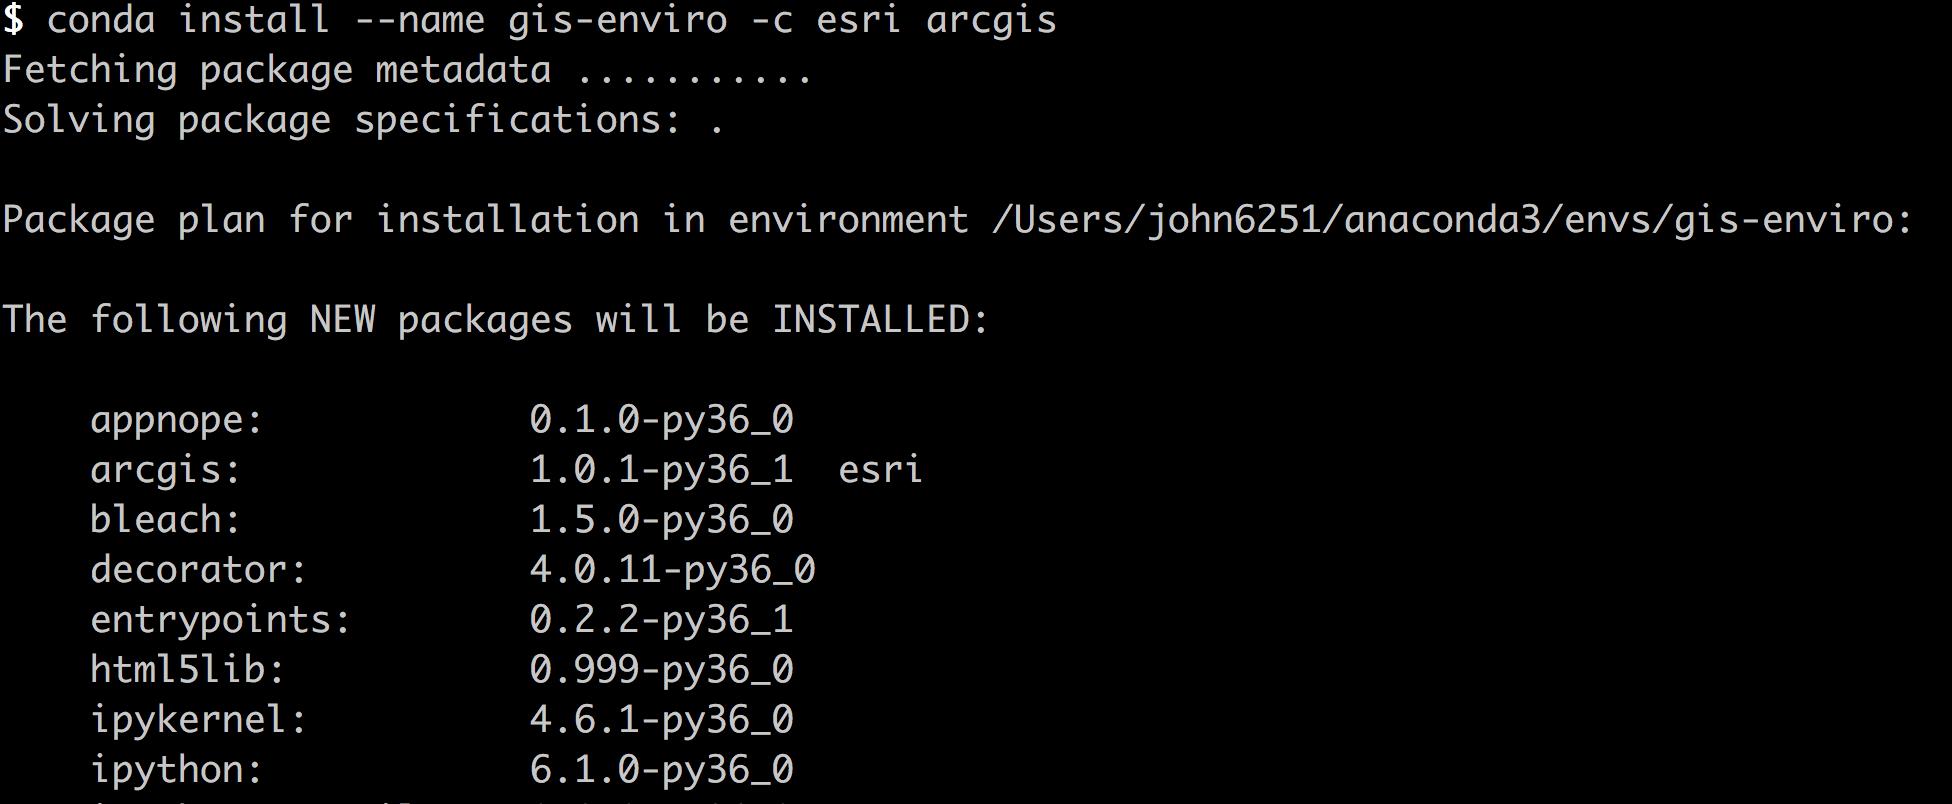 Setting up an ArcGIS API for Python development environment